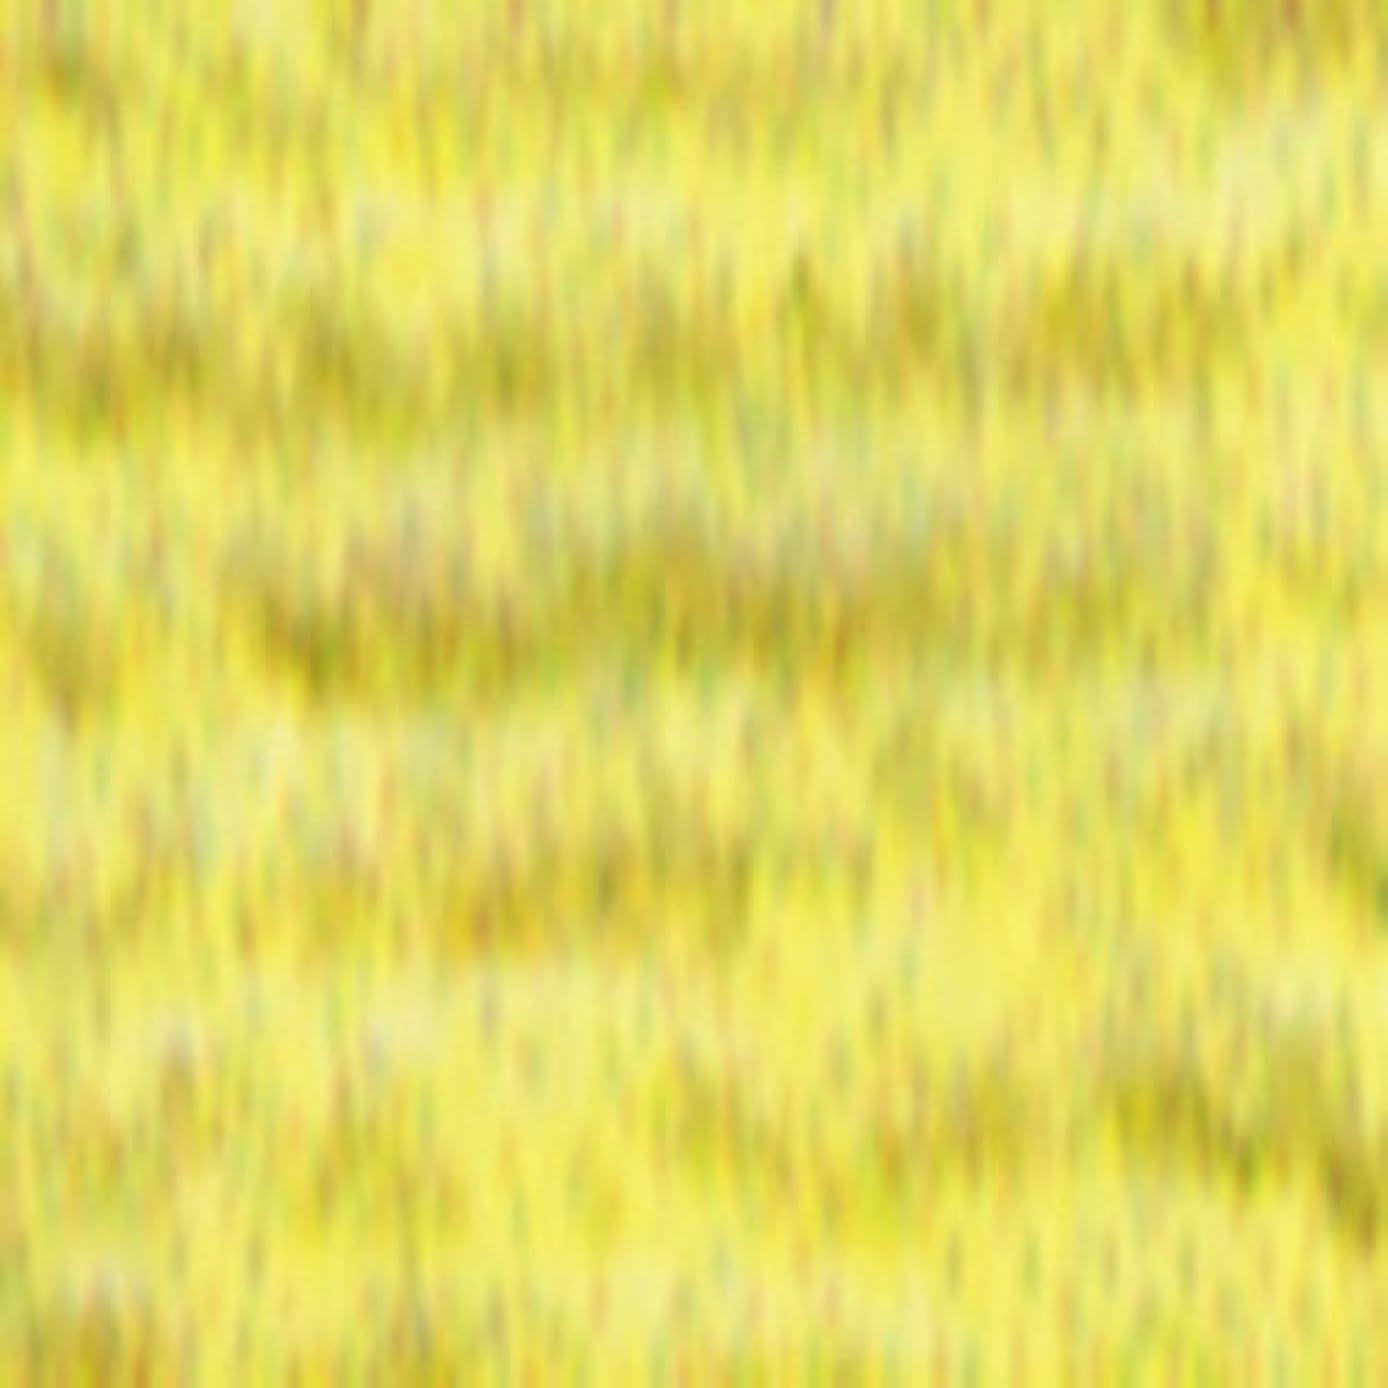 Sullivans Six Strand Embroidery Cotton 8.7 Yards-Very Light Topaz 12 per box